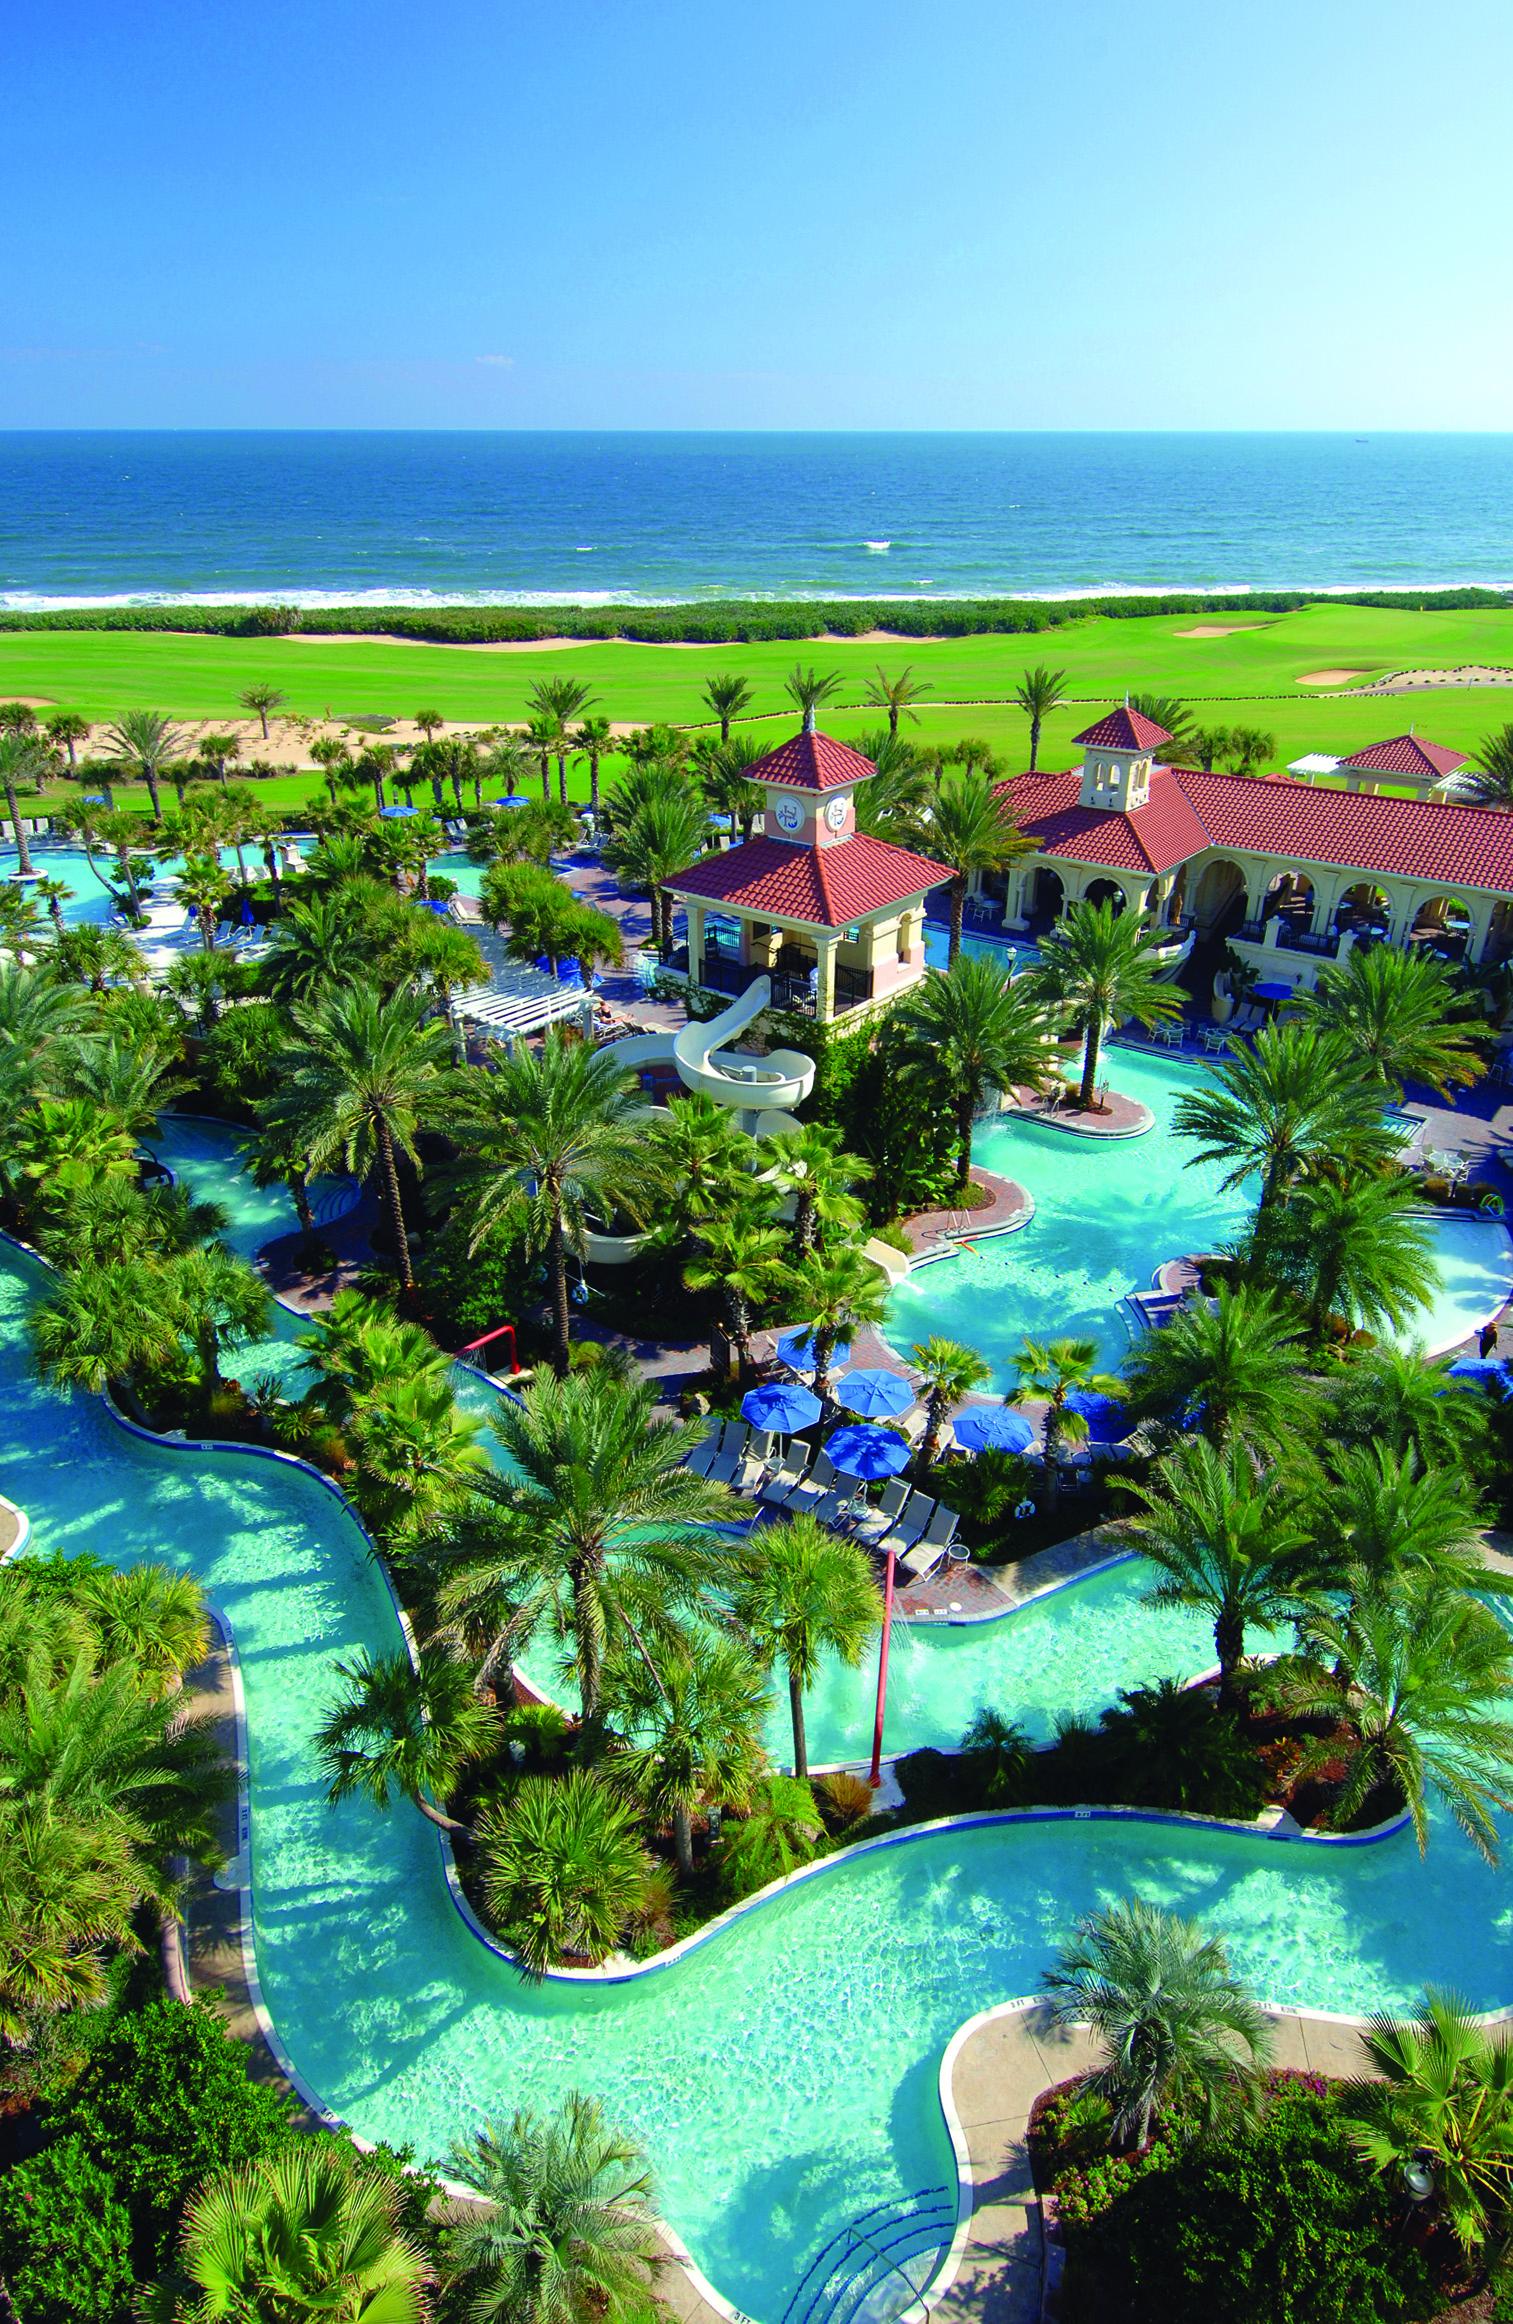 The early bird gets the summer savings at  Hammock Beach Resort